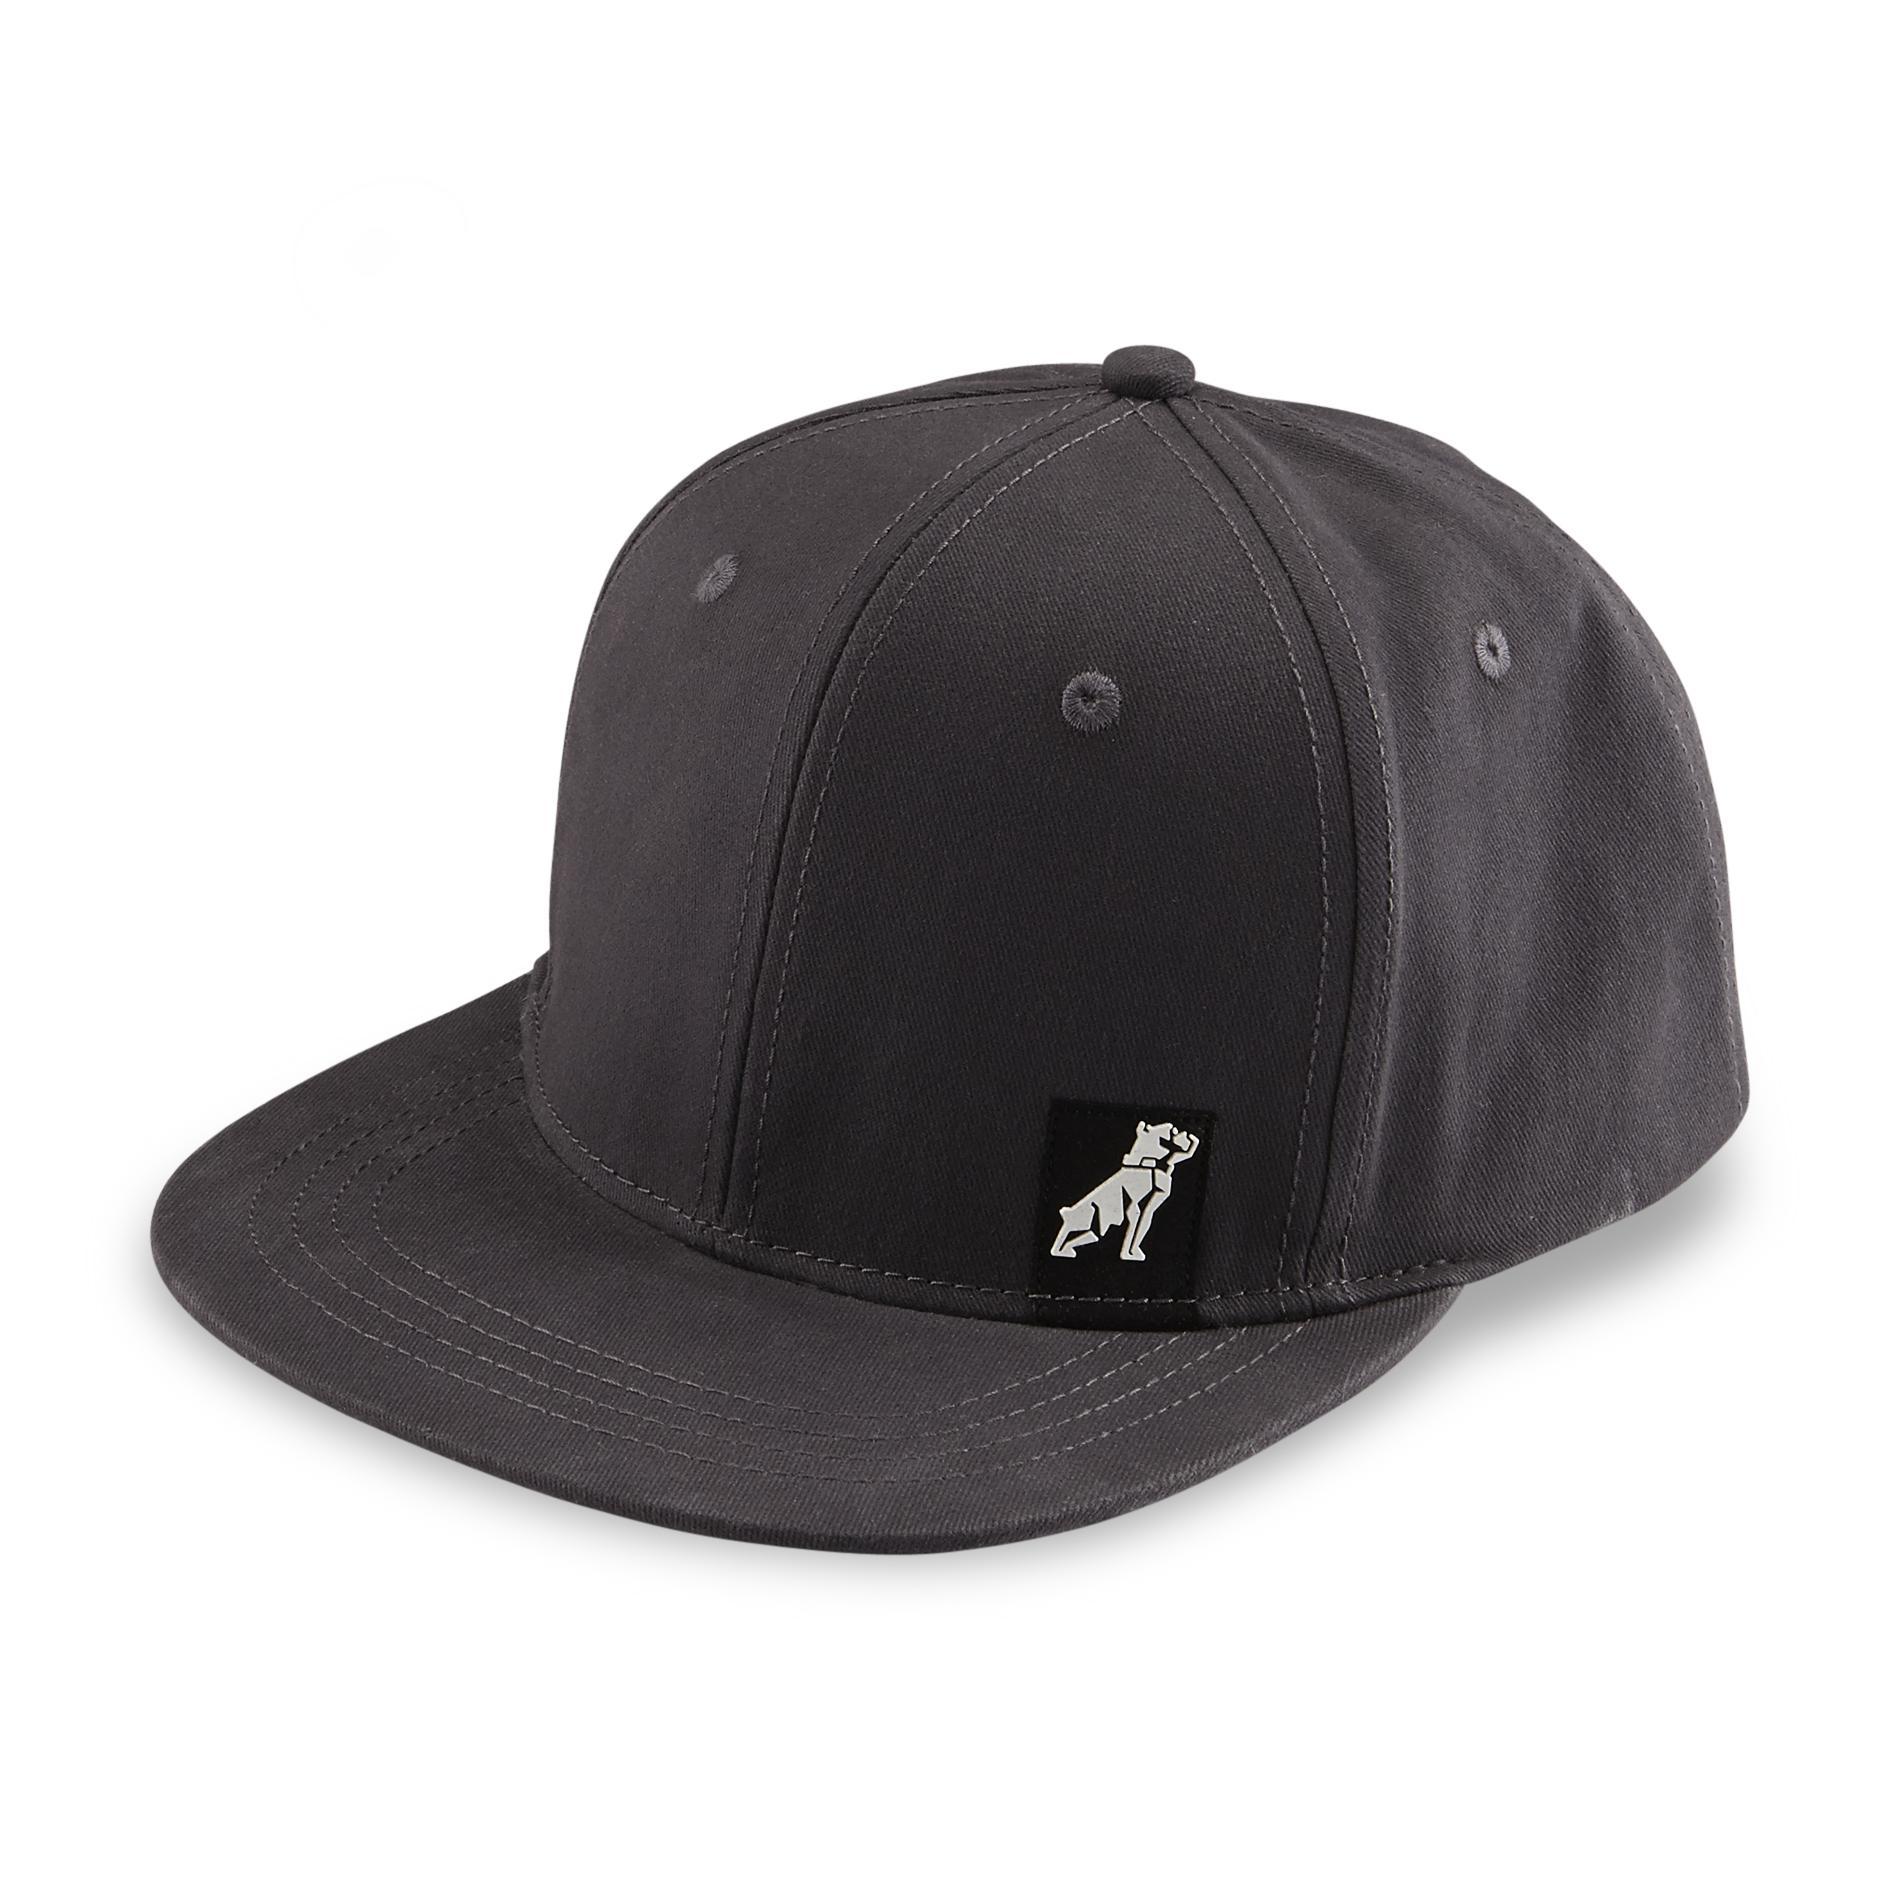 Men's Flat-Billed Baseball Cap - Mack